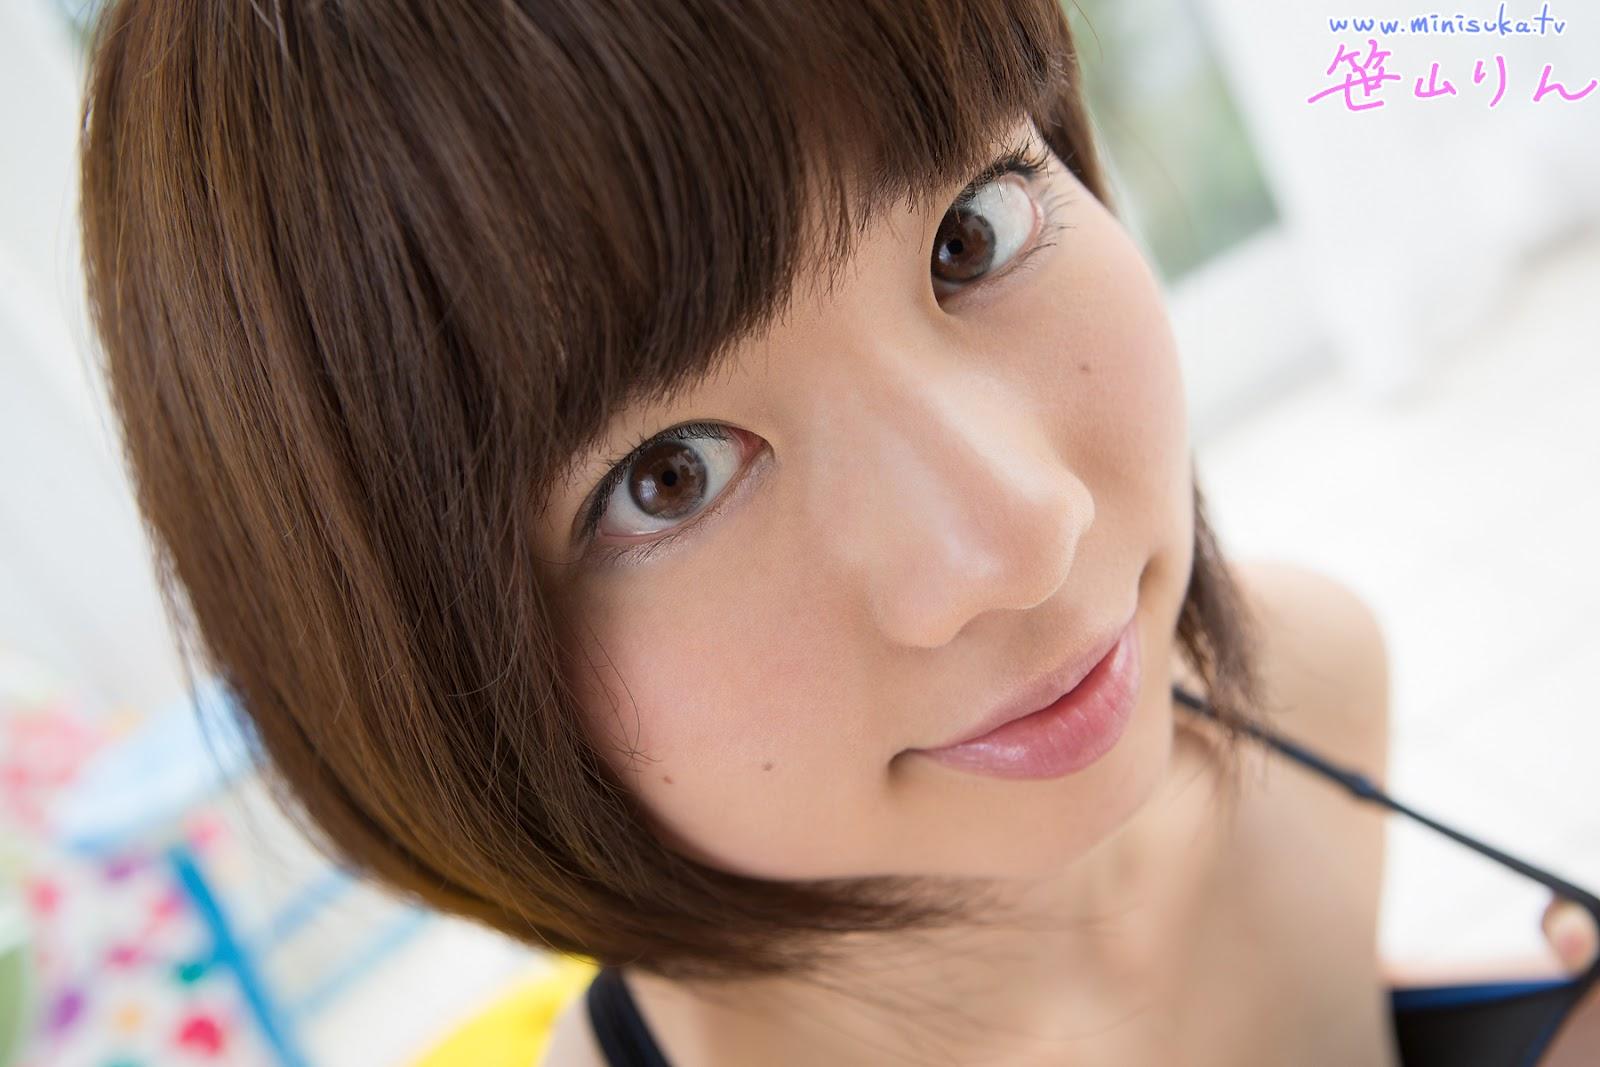 sasayama girls Ogy-005 rin sasayama 笹山りん/君の想うまま ogy-005 rin sasayama 笹山りん/君の想うまま video: mp4 854x480 archive: rar file size 296.